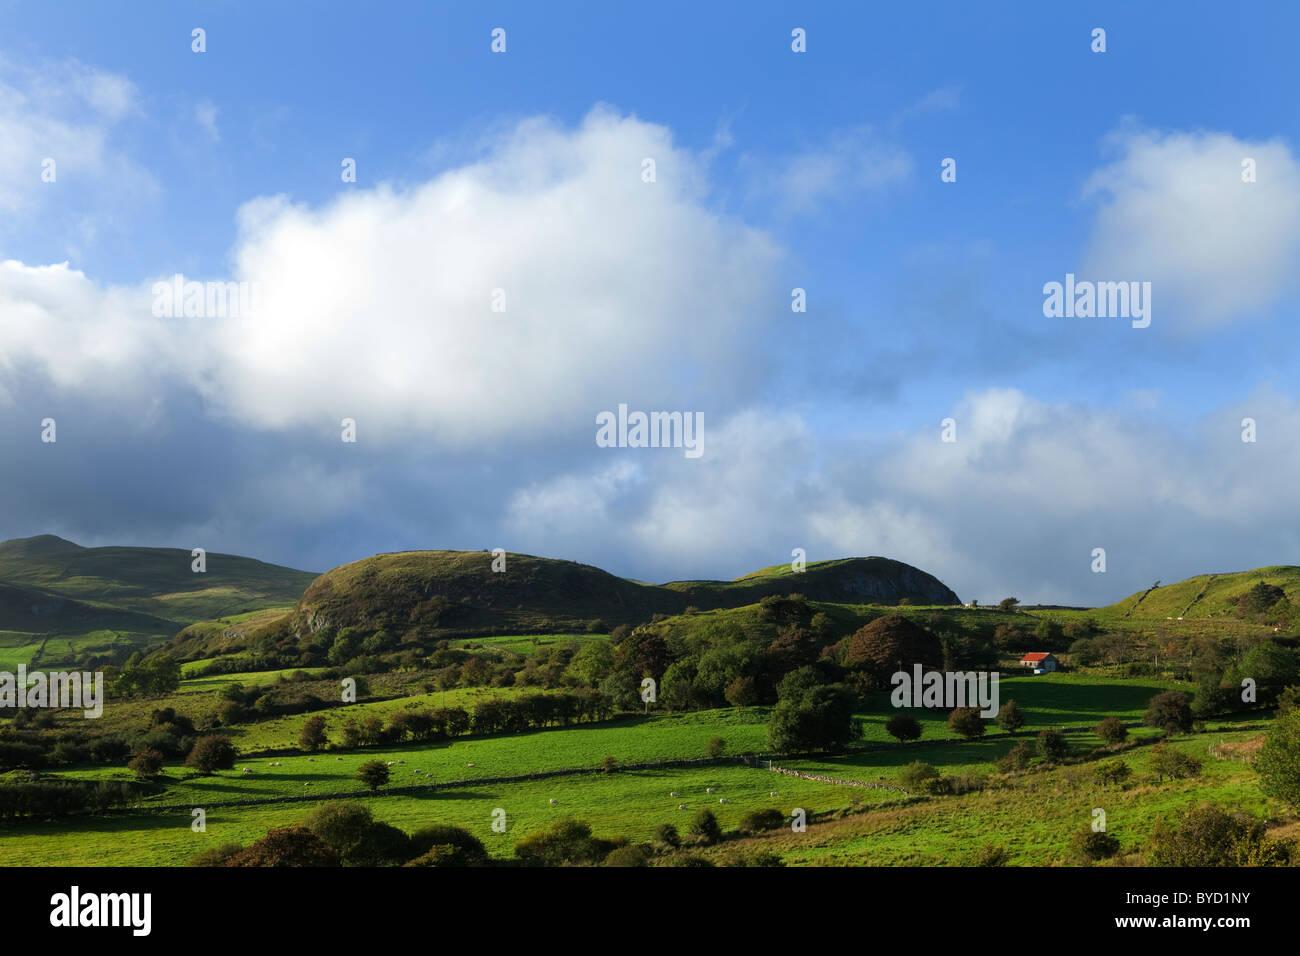 Pastoral Countyside and Hill Farm Near Leean Mountain, County Leitrim. Ireland Stock Photo